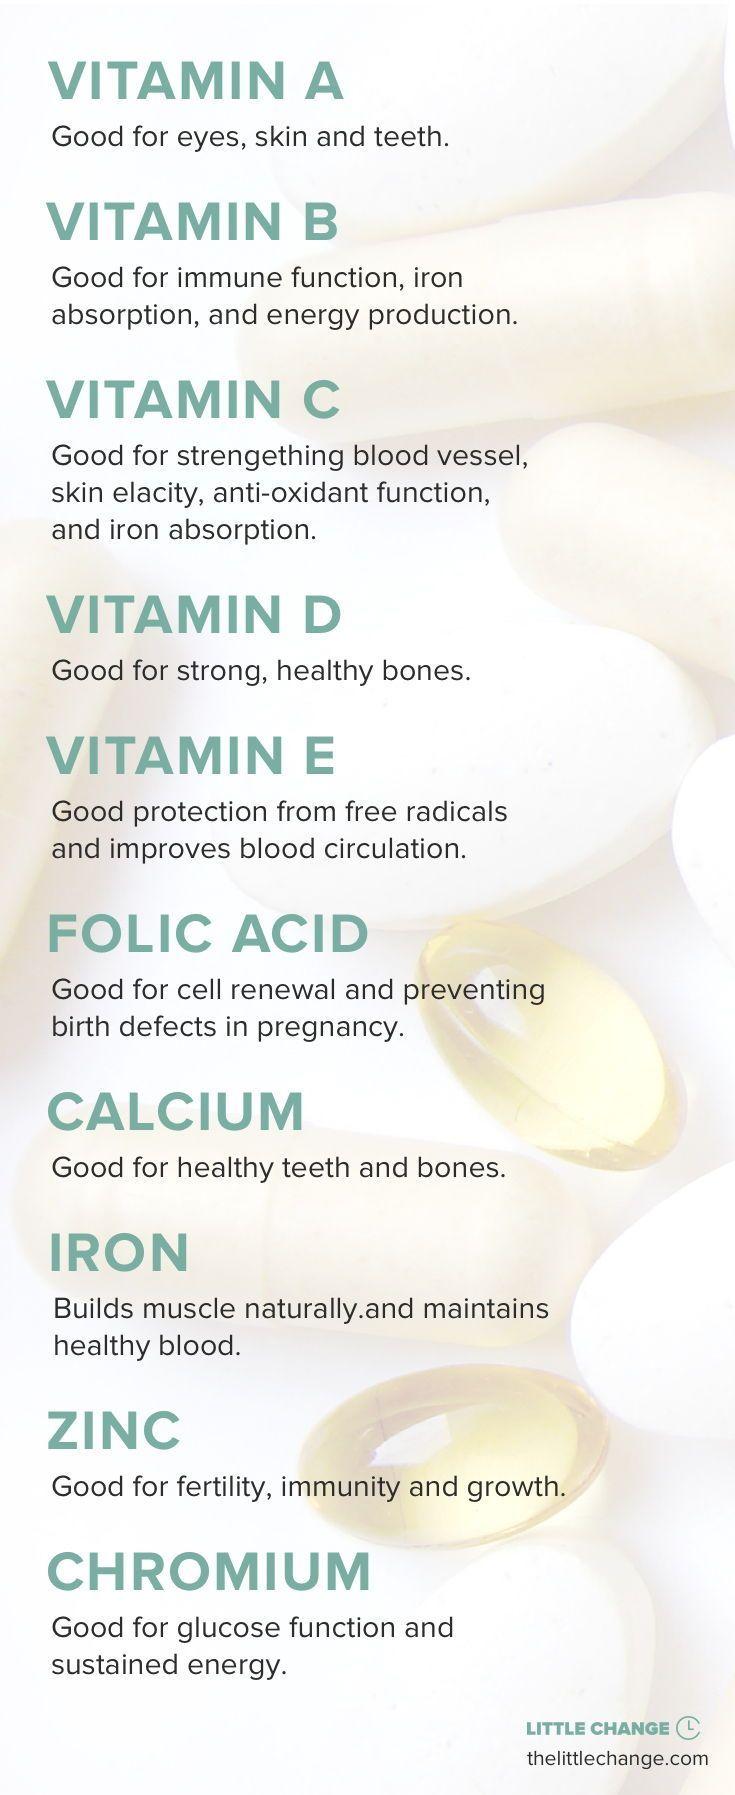 The Benefits of Vitamins  #vitamins #supplements #health #healthy #healthbenefits #exercisehealthben...